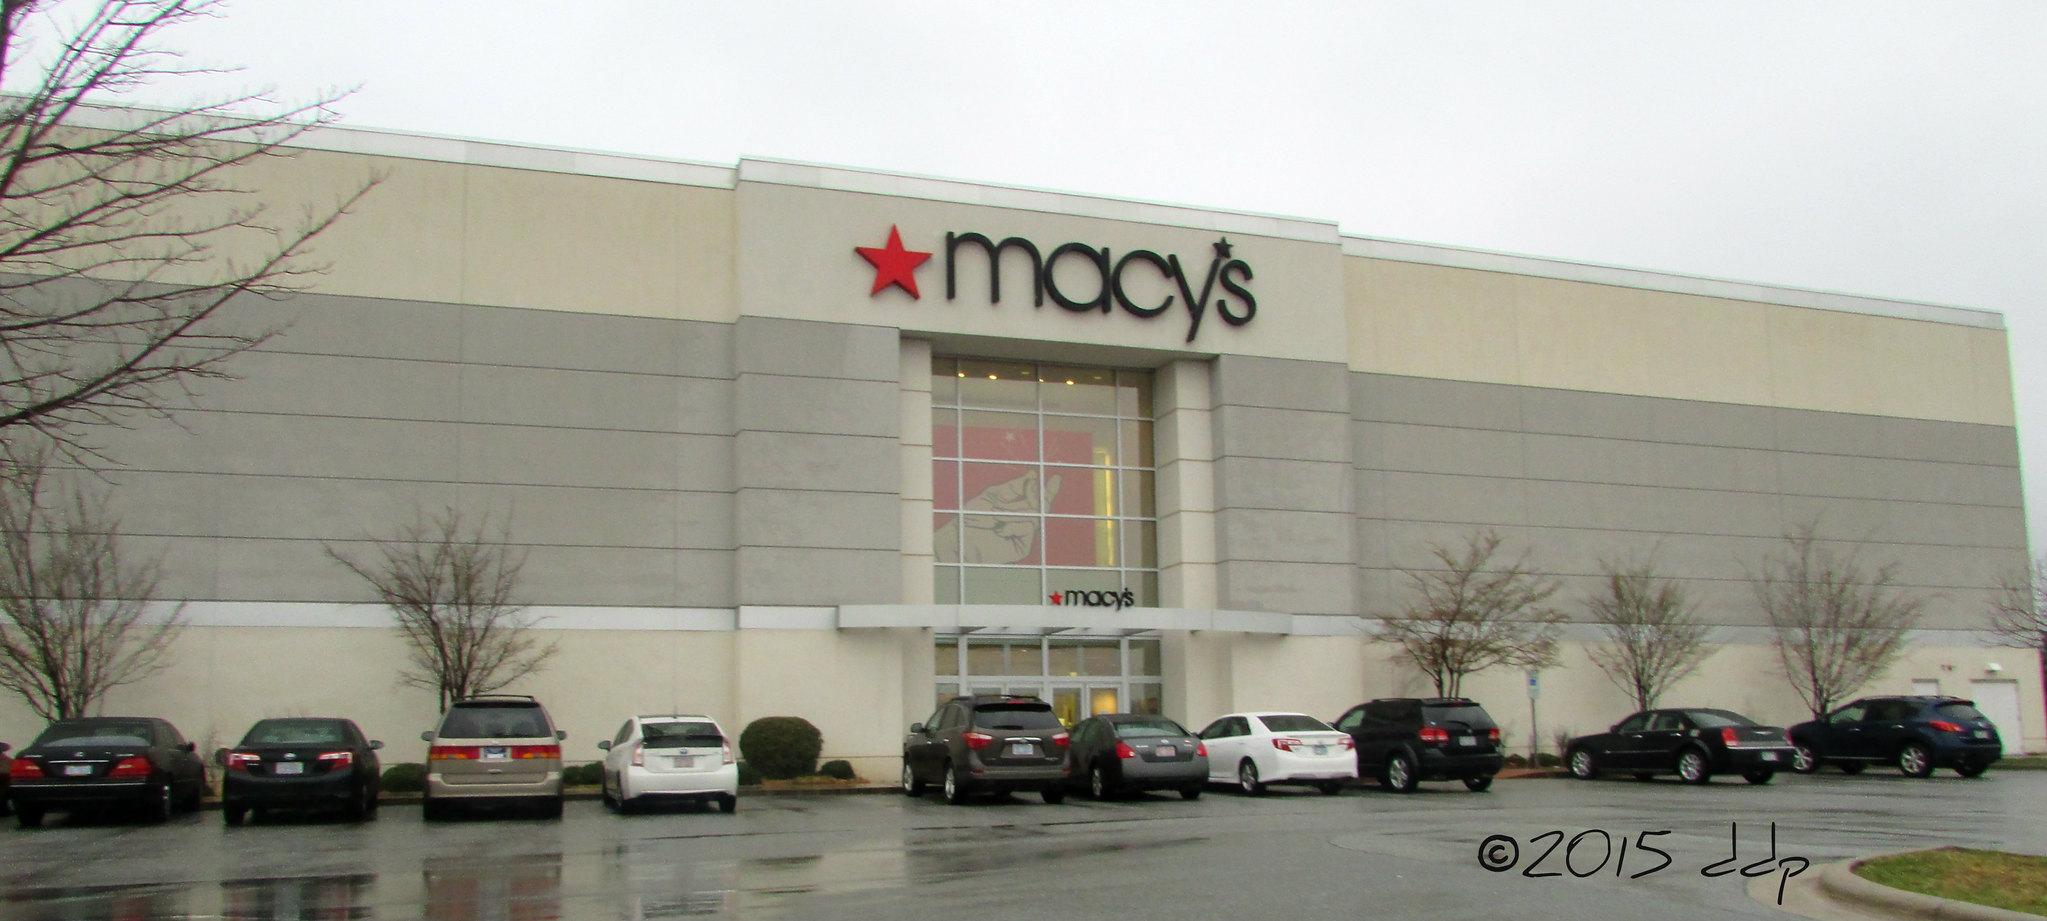 Macy's --Wendover, Greensboro, NC